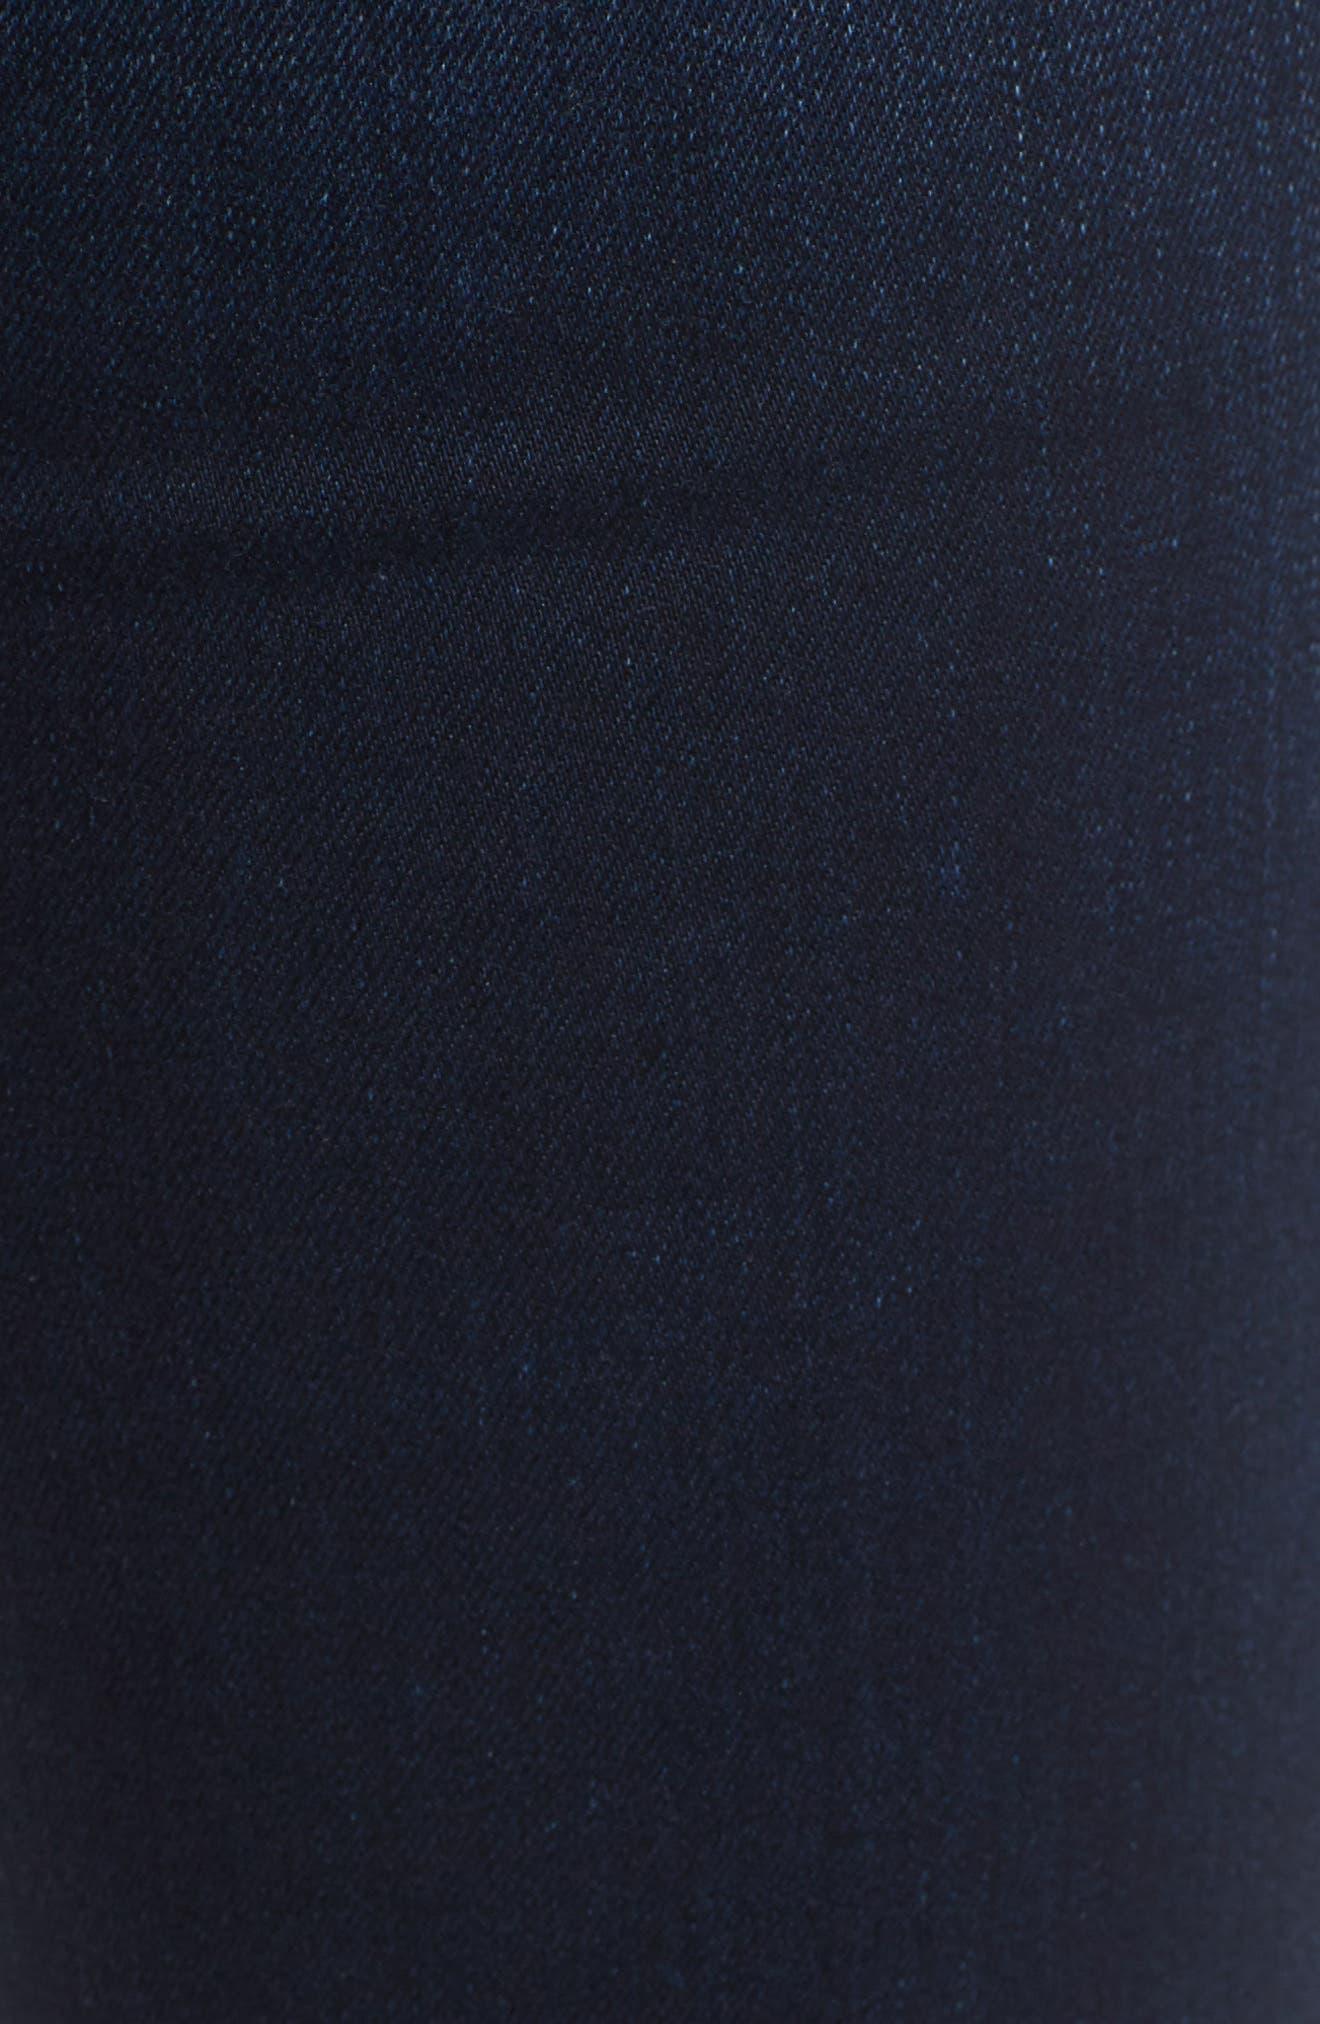 'Collin' Supermodel Skinny Jeans,                             Alternate thumbnail 5, color,                             CREST FALL